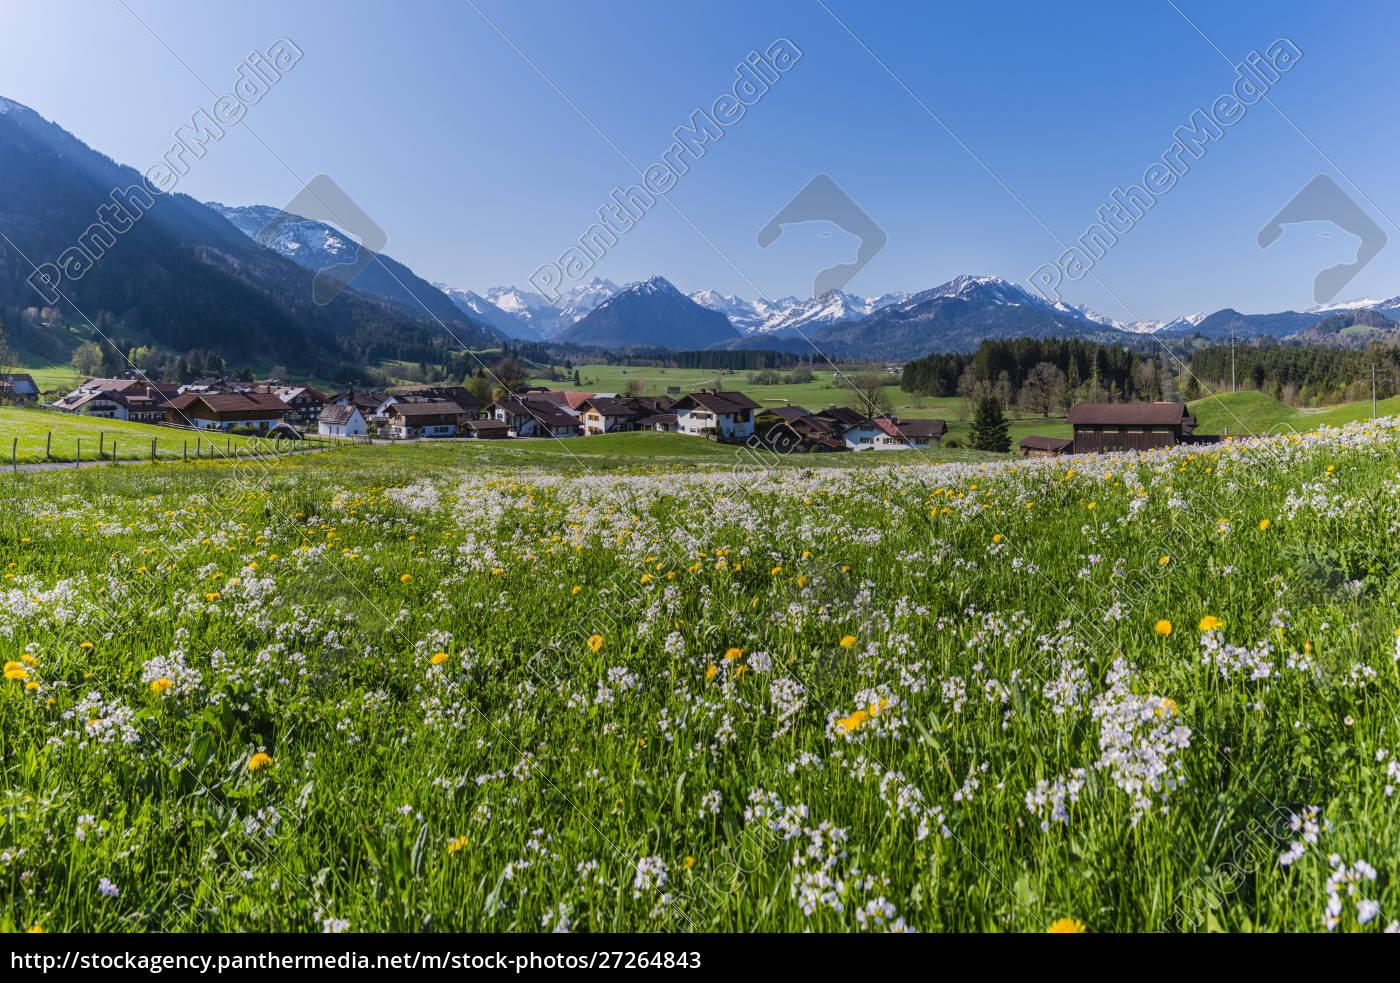 germania, baviera, allgaeu, oberallgaeu, alpi, allgaeu, illertal, rubi - 27264843